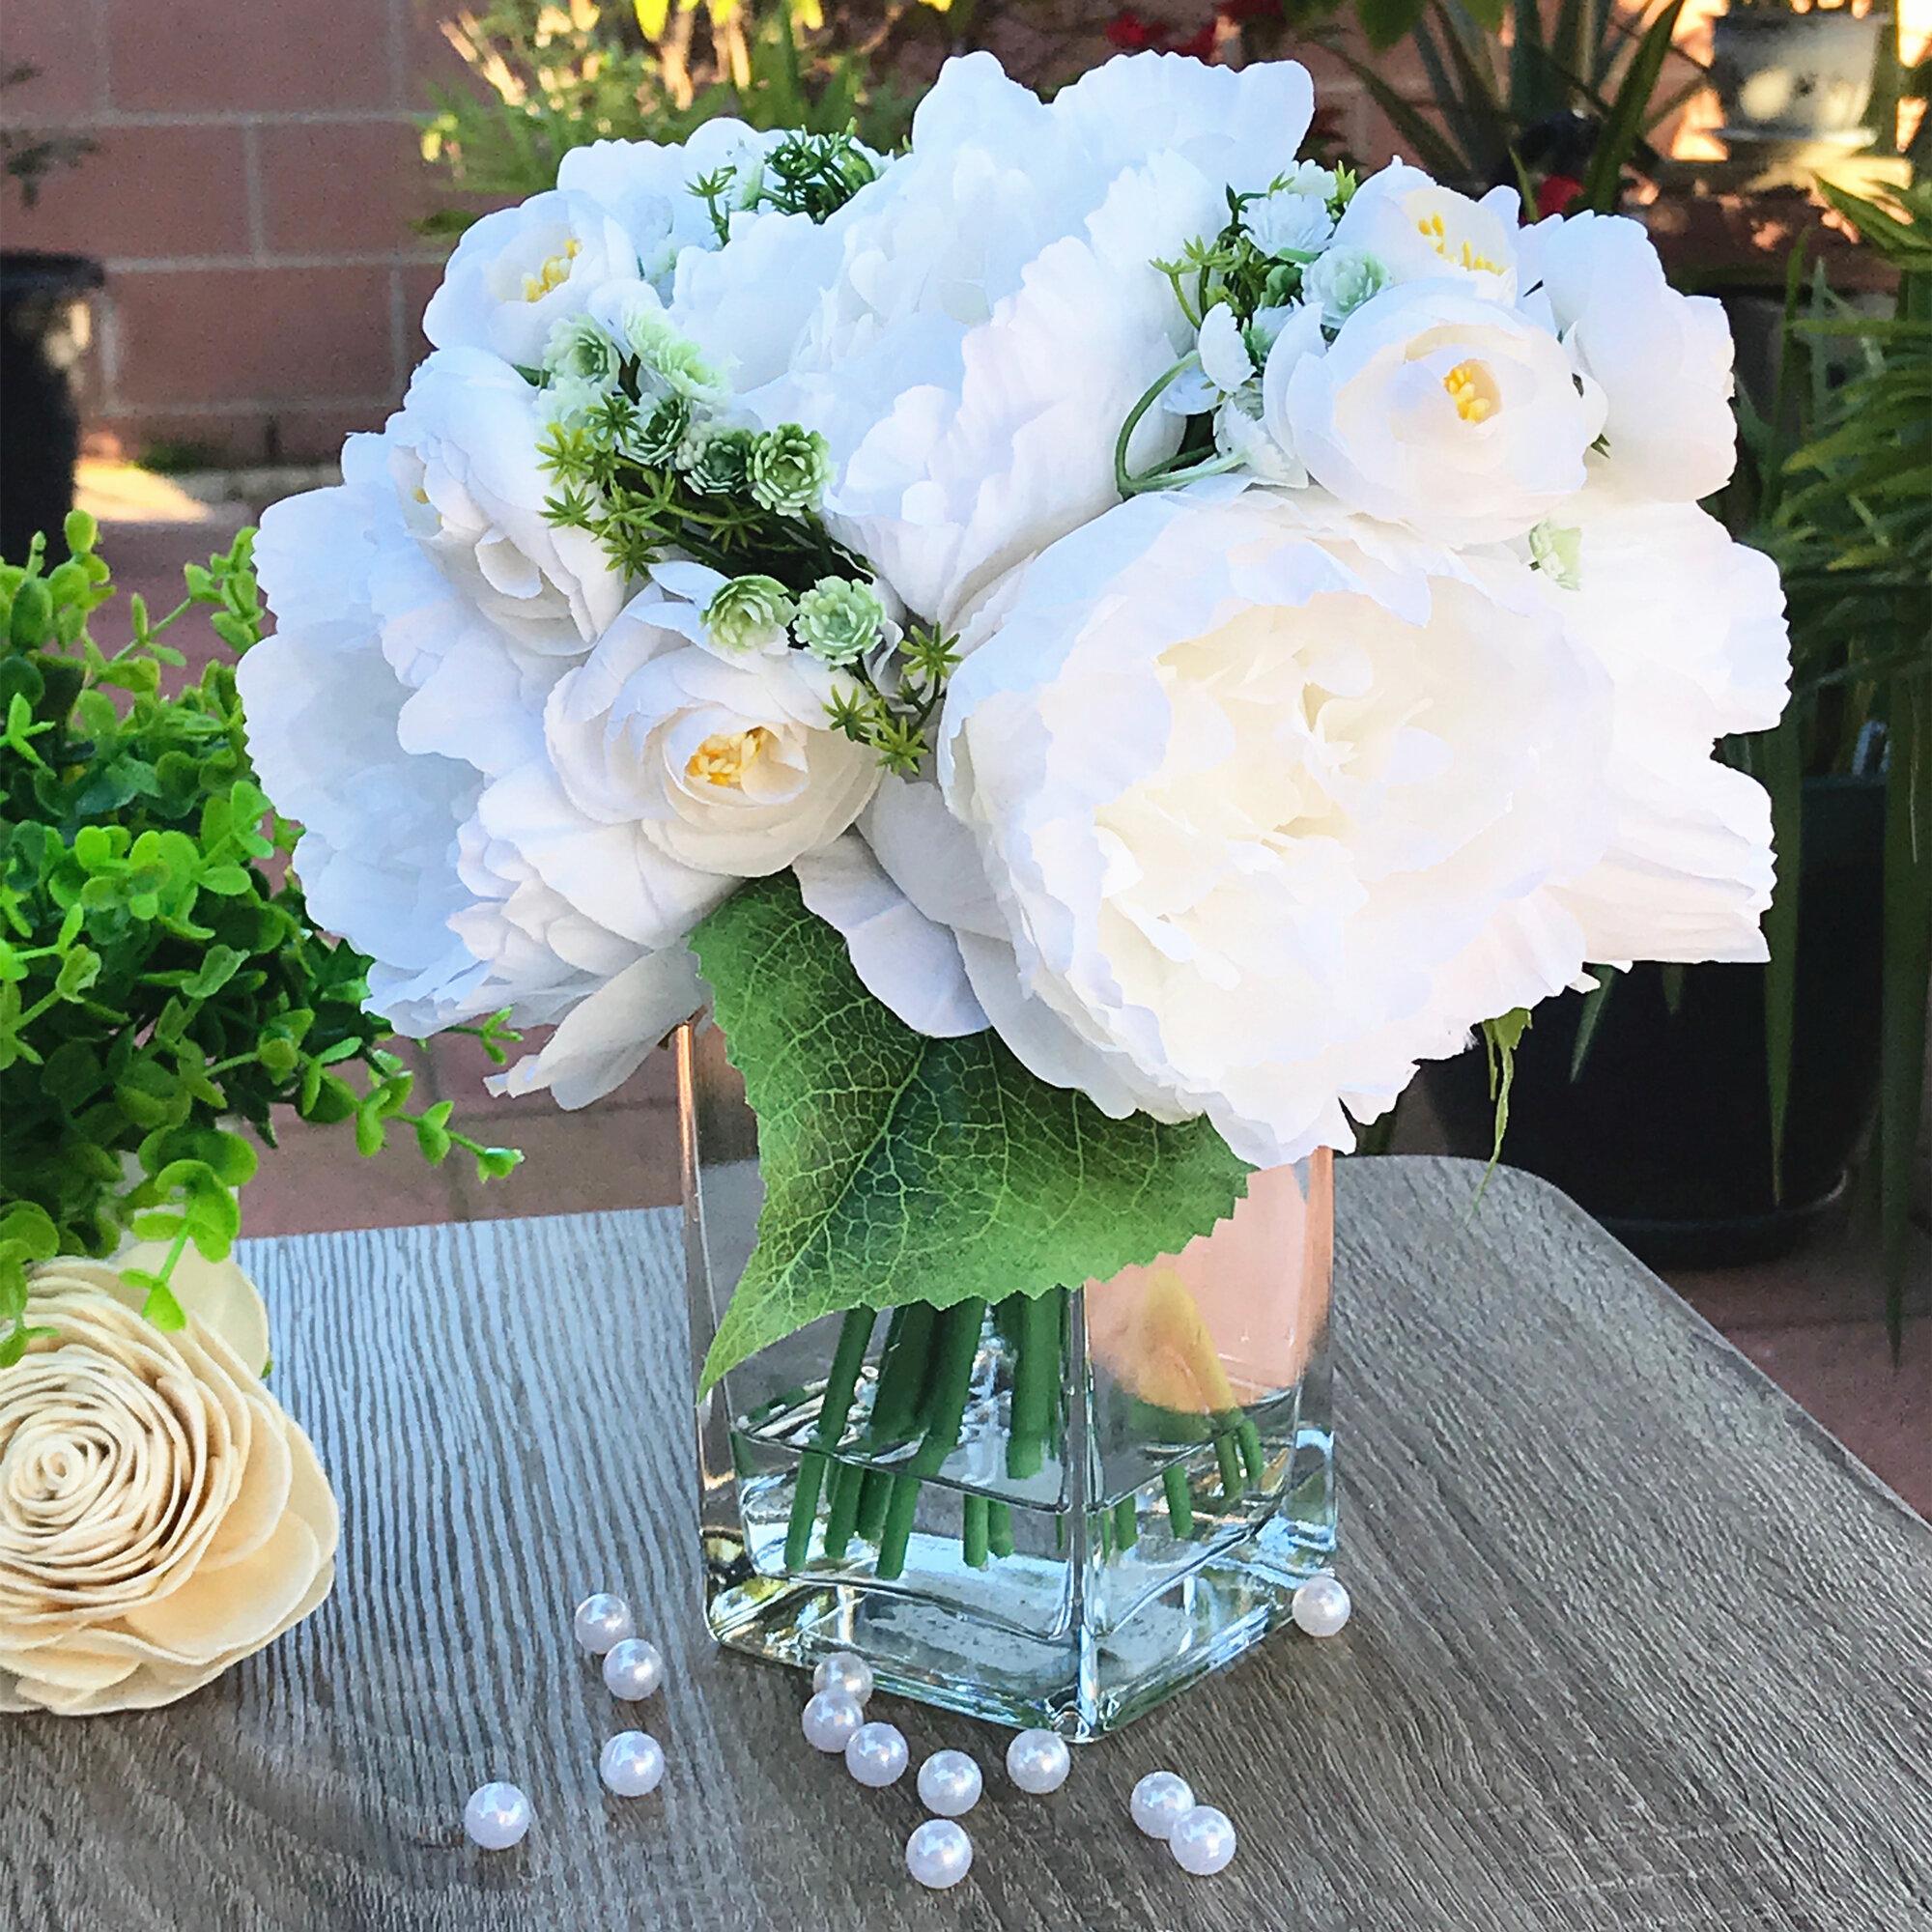 House Of Hampton Artificial Peony Mixed Flower Arrangement In Vase Reviews Wayfair